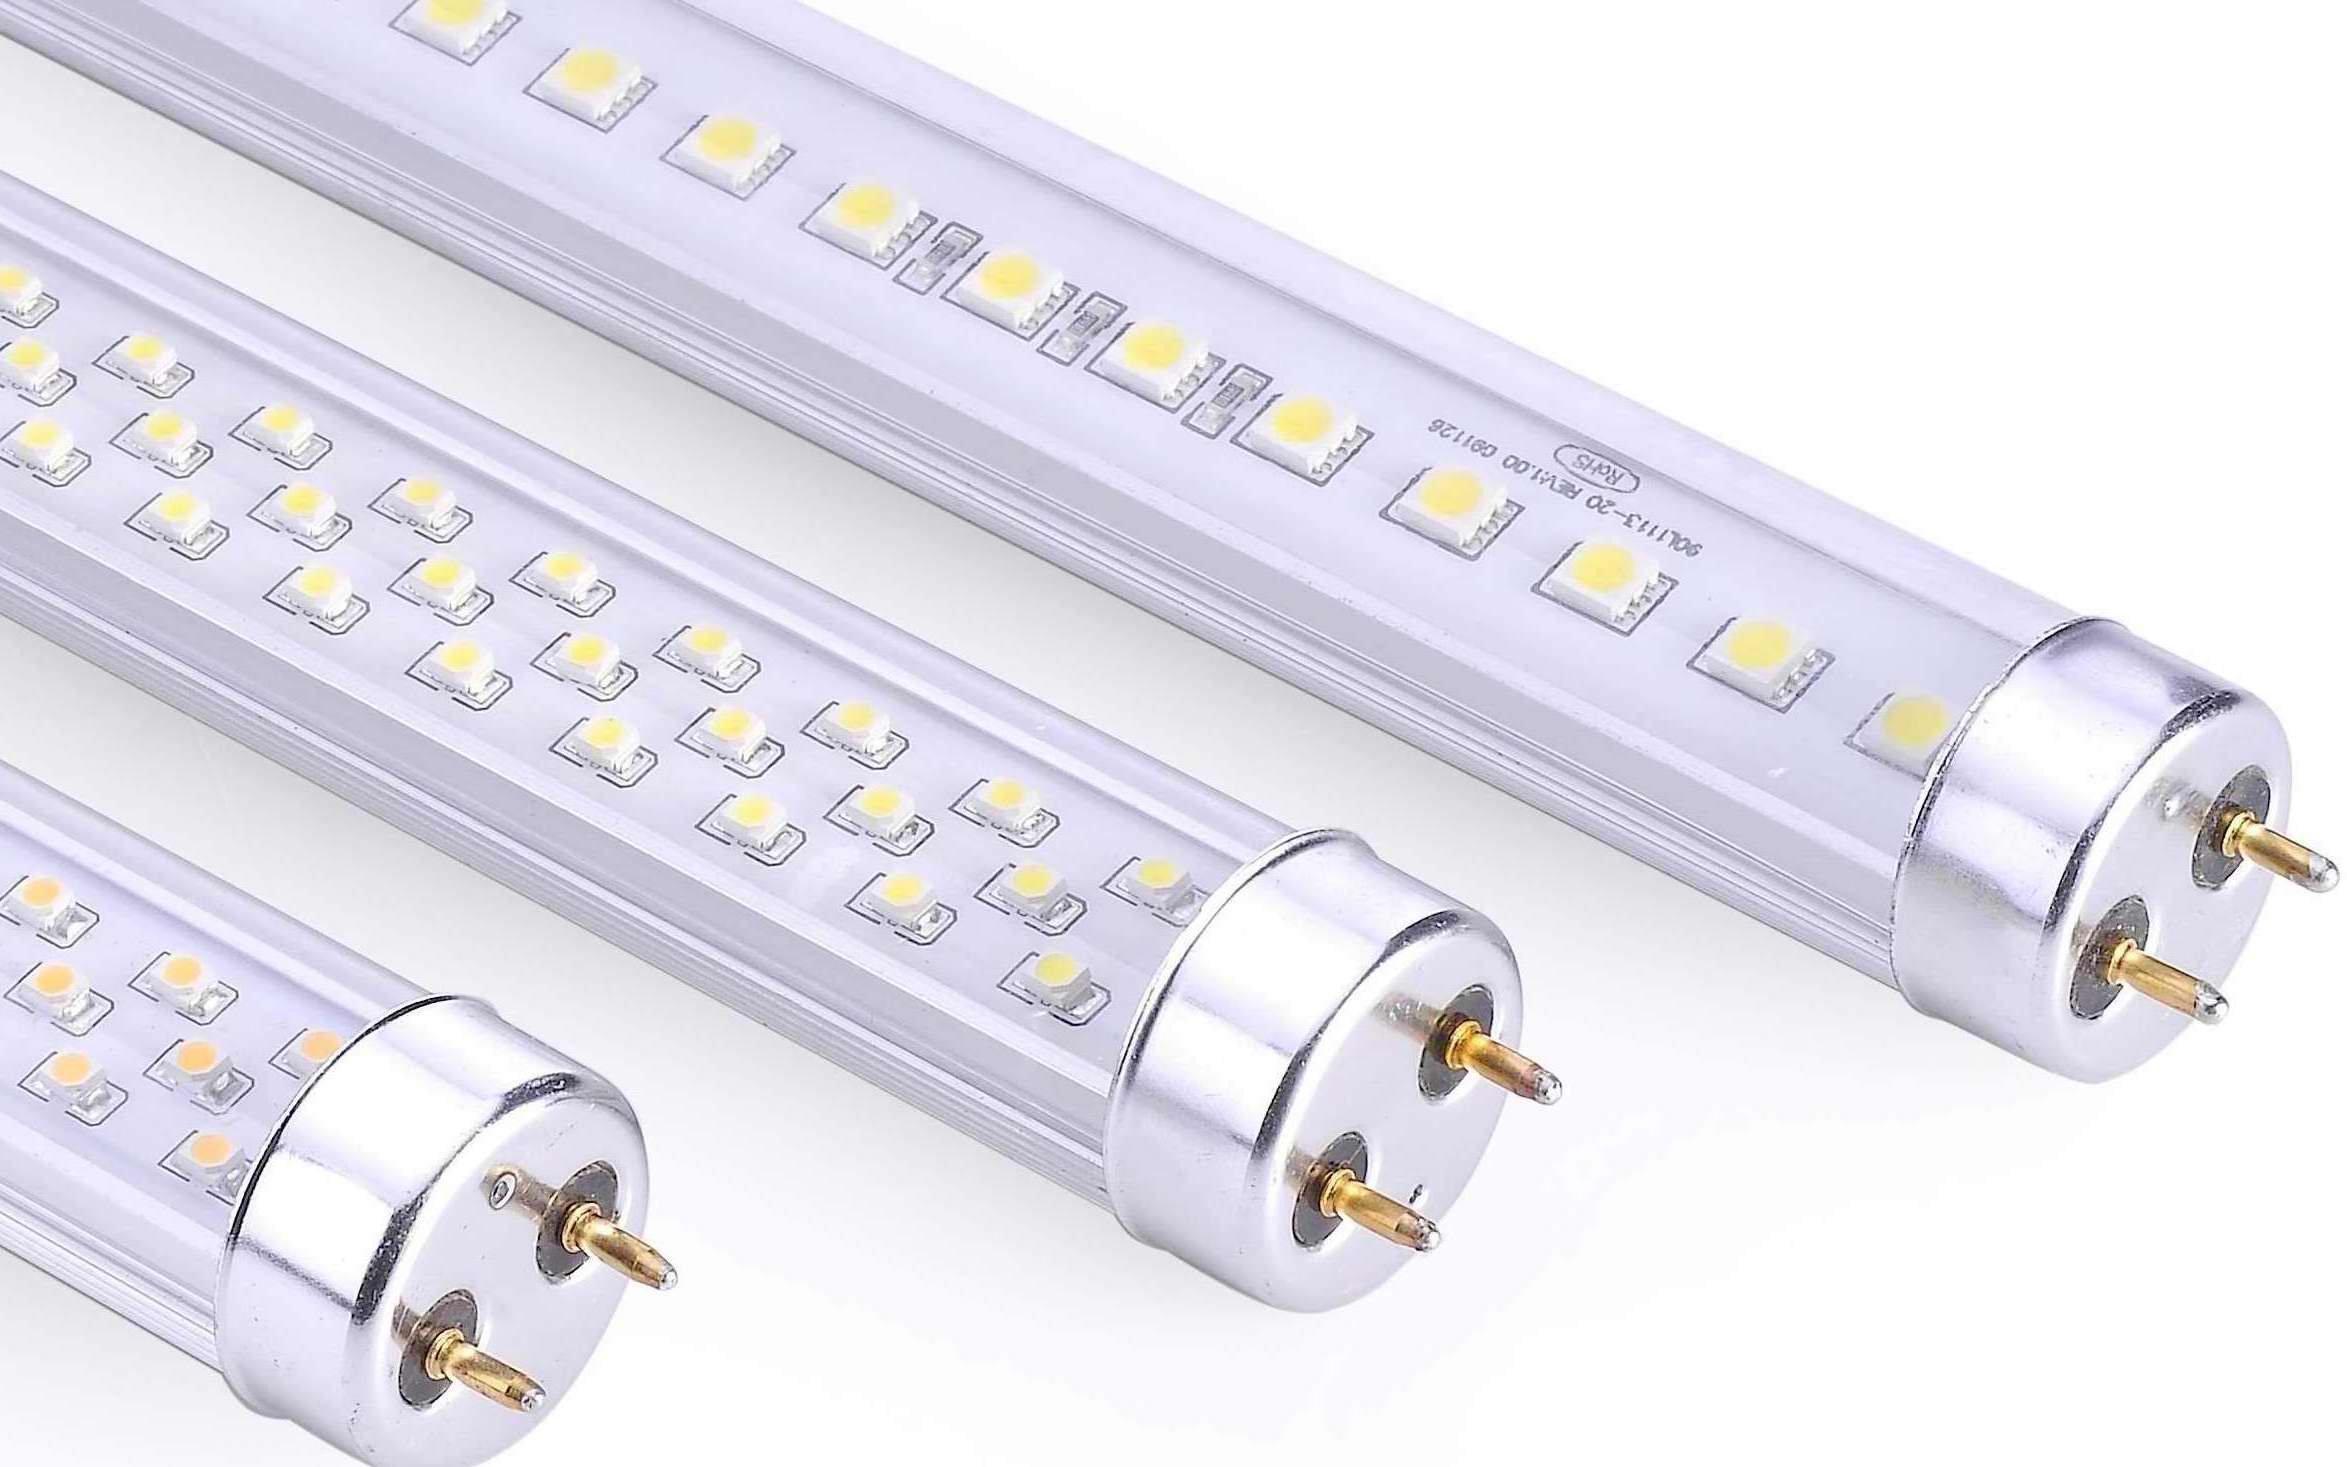 High Quality Free Shipping Led T8 Tube Lamps 0 6m Led